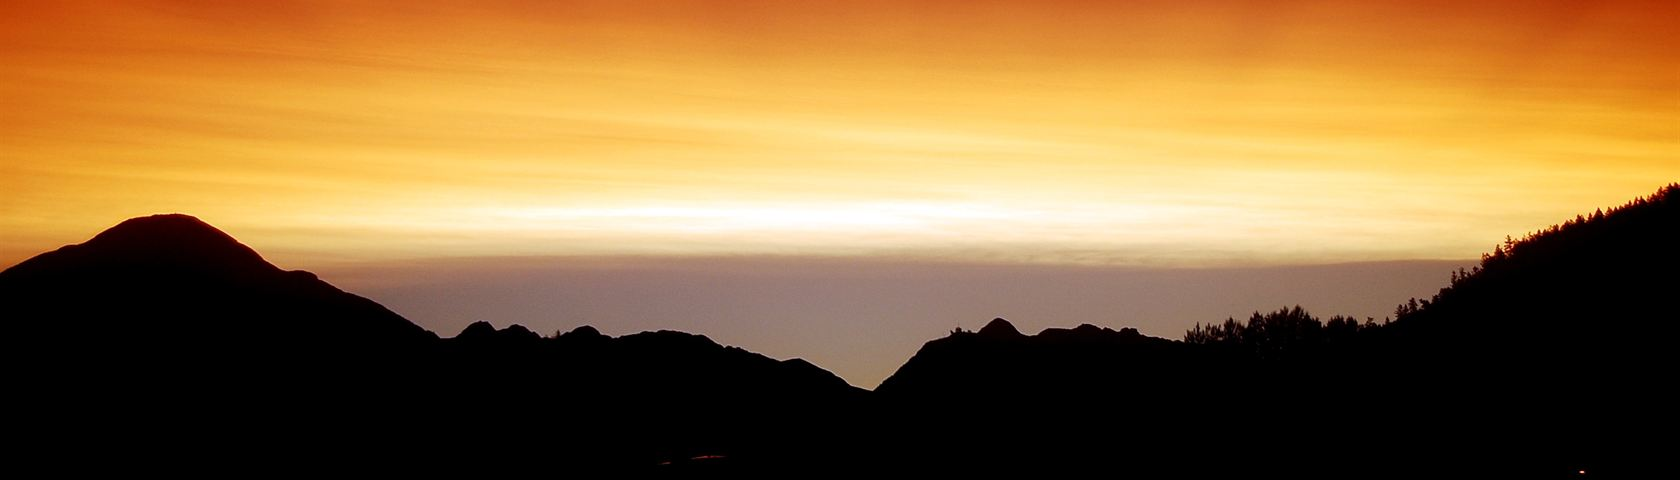 Mount Curie Sunset